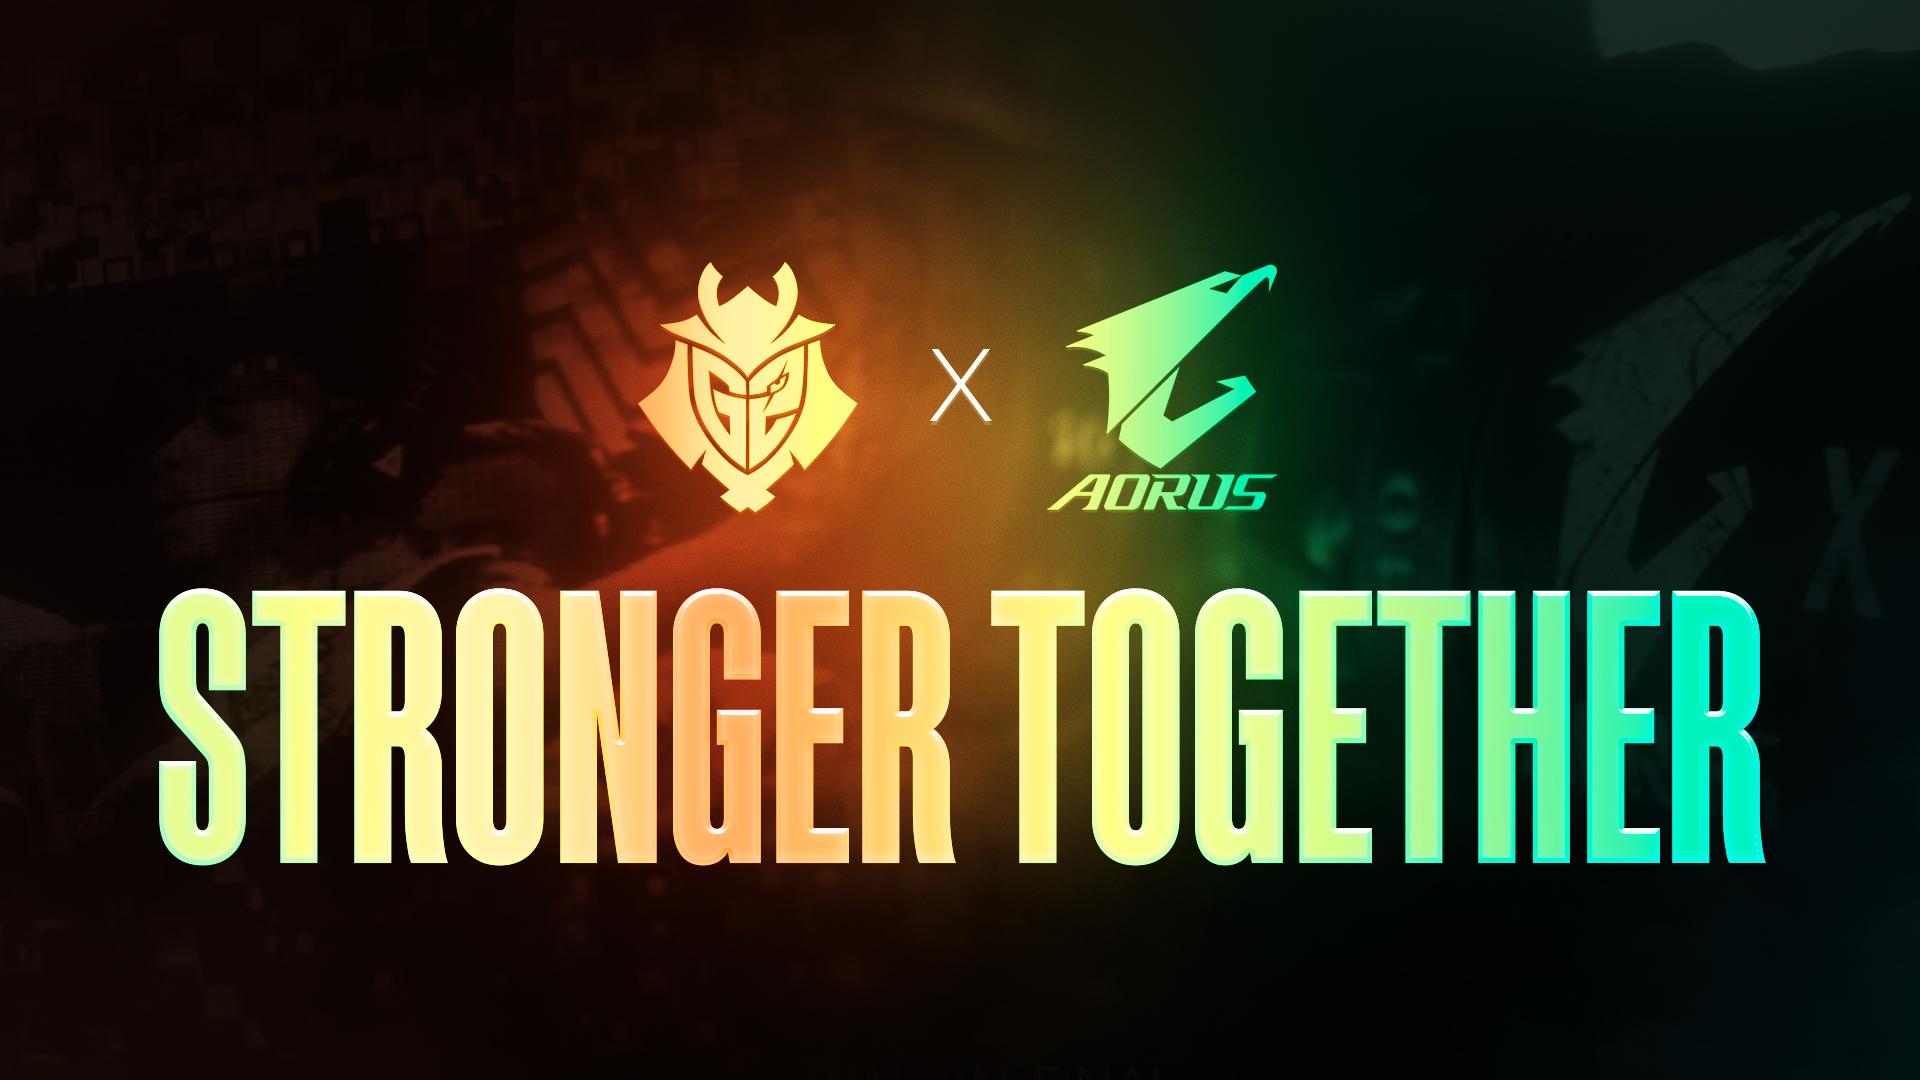 Gigabyte aorus and g2 esports renew partnership